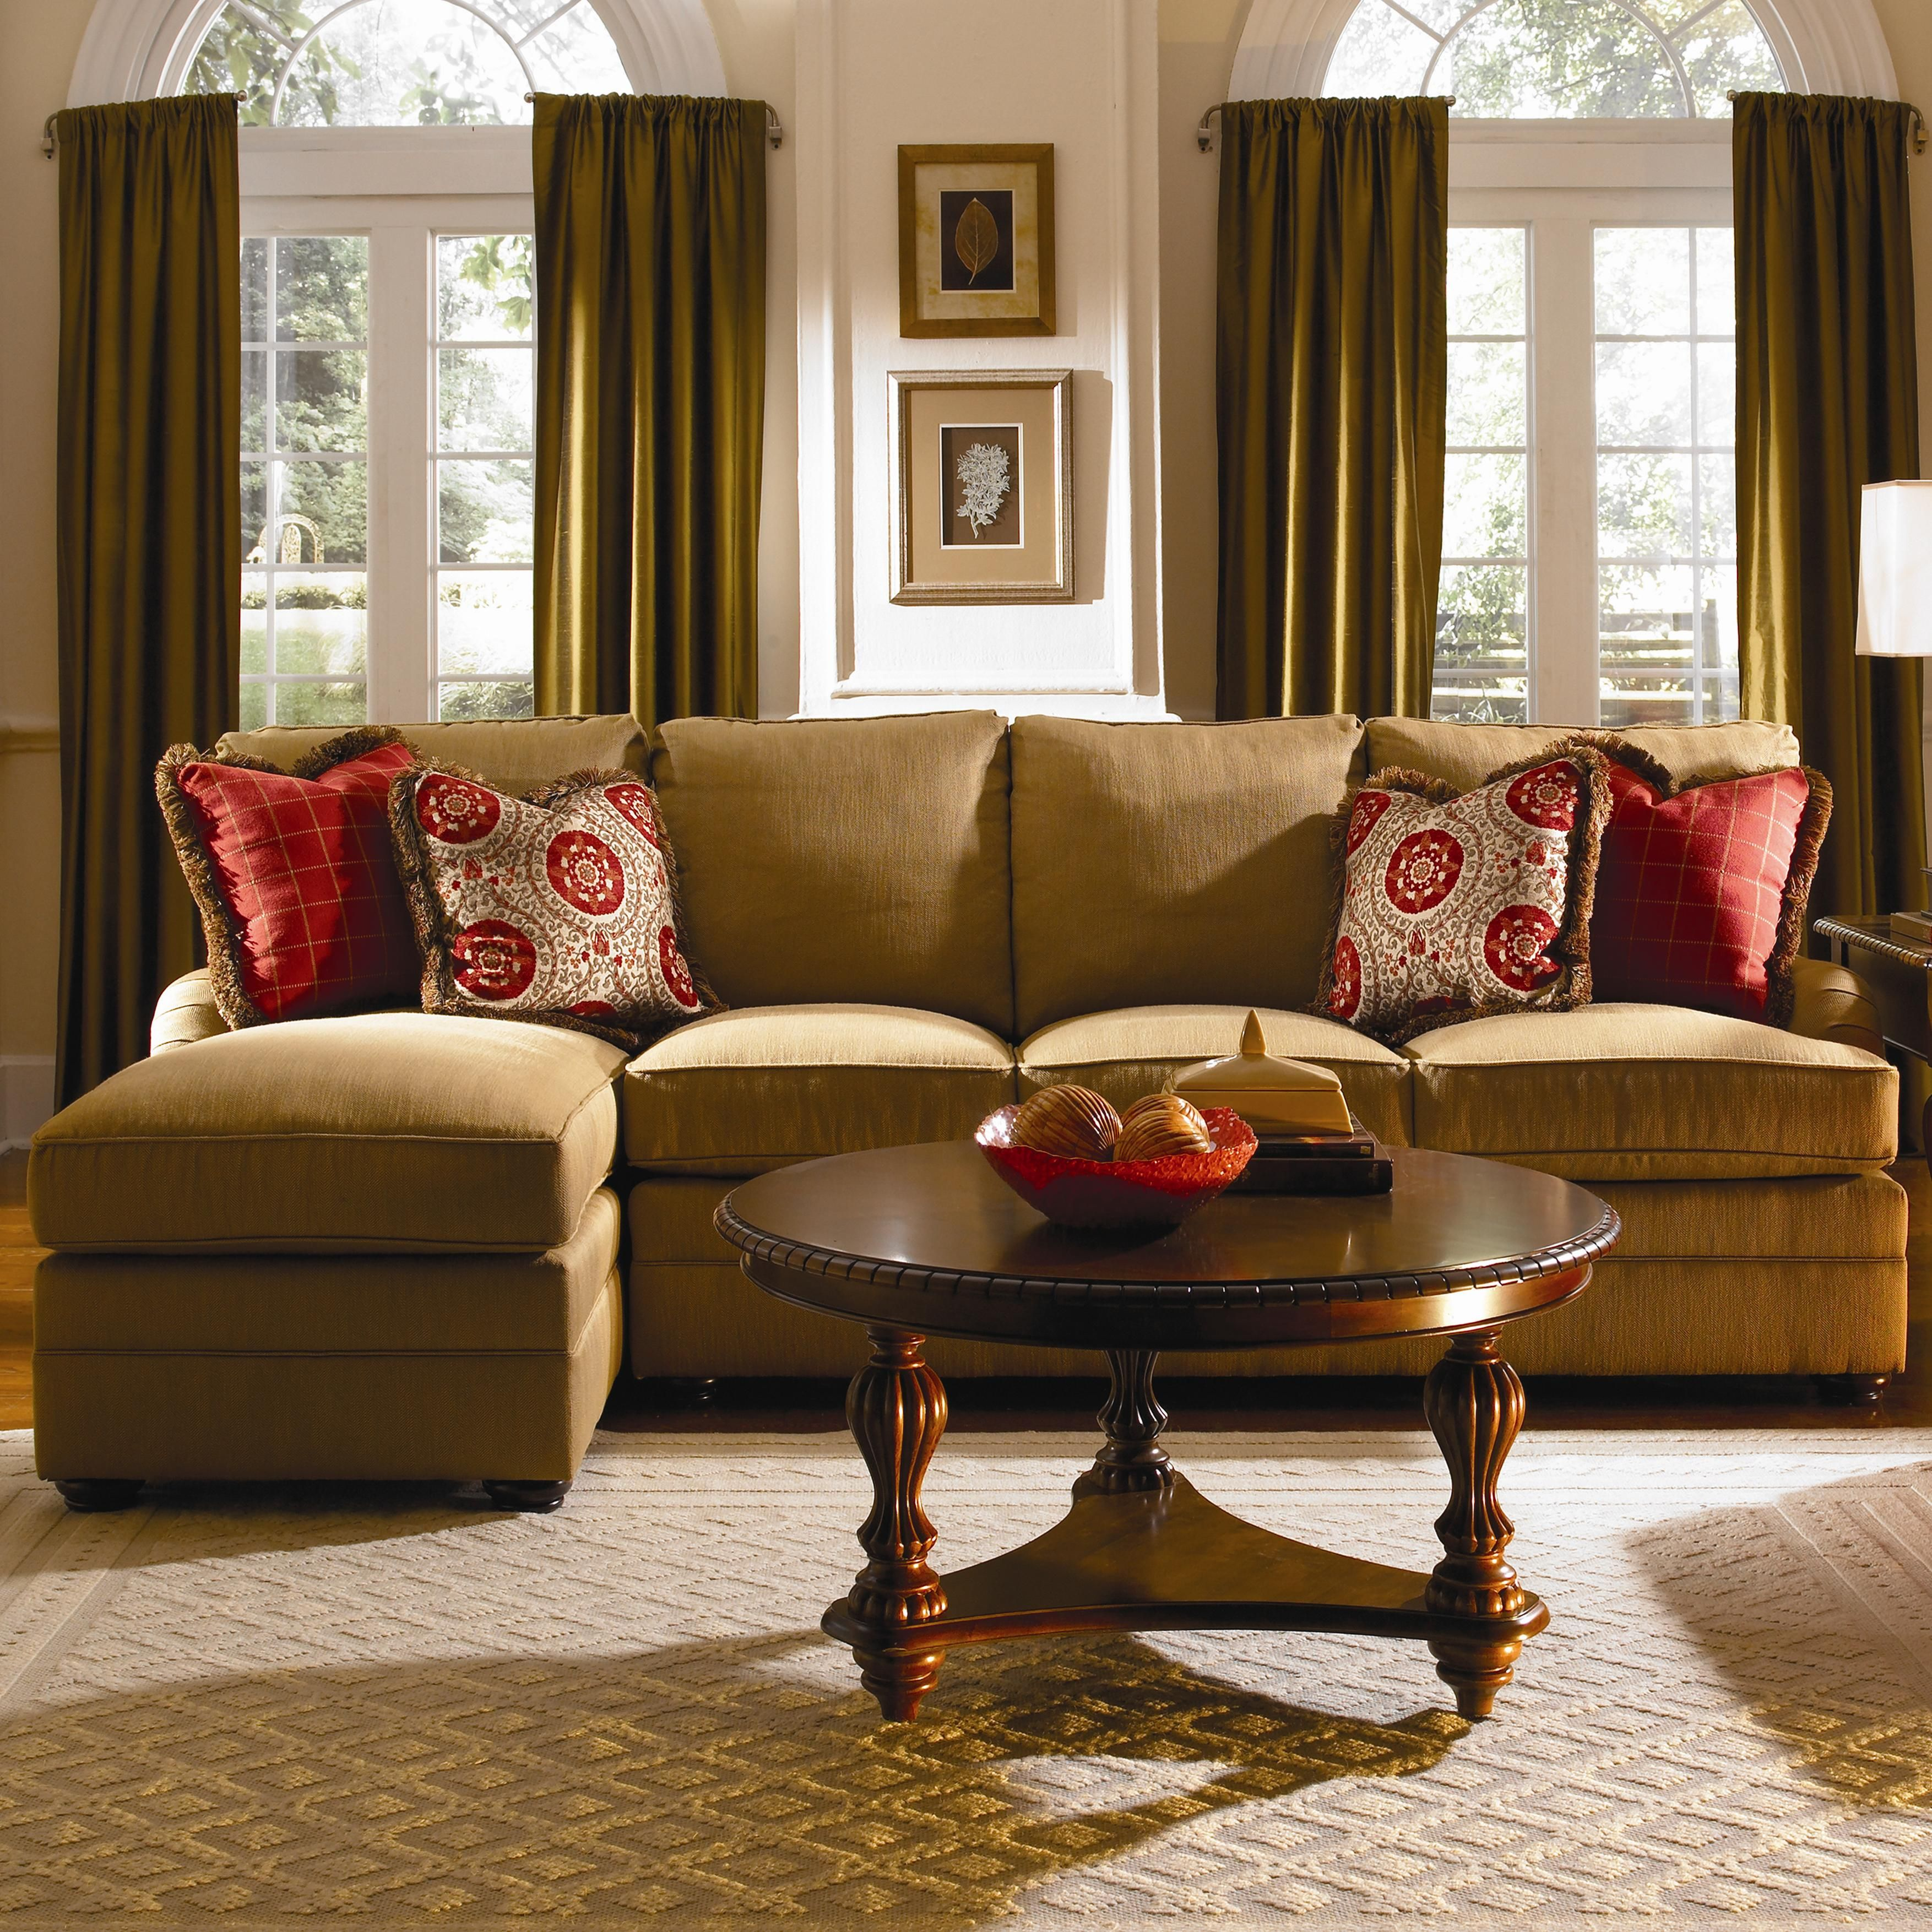 Custom Select Upholstery Custom 2 Piece Sectional Sofa by Kincaid